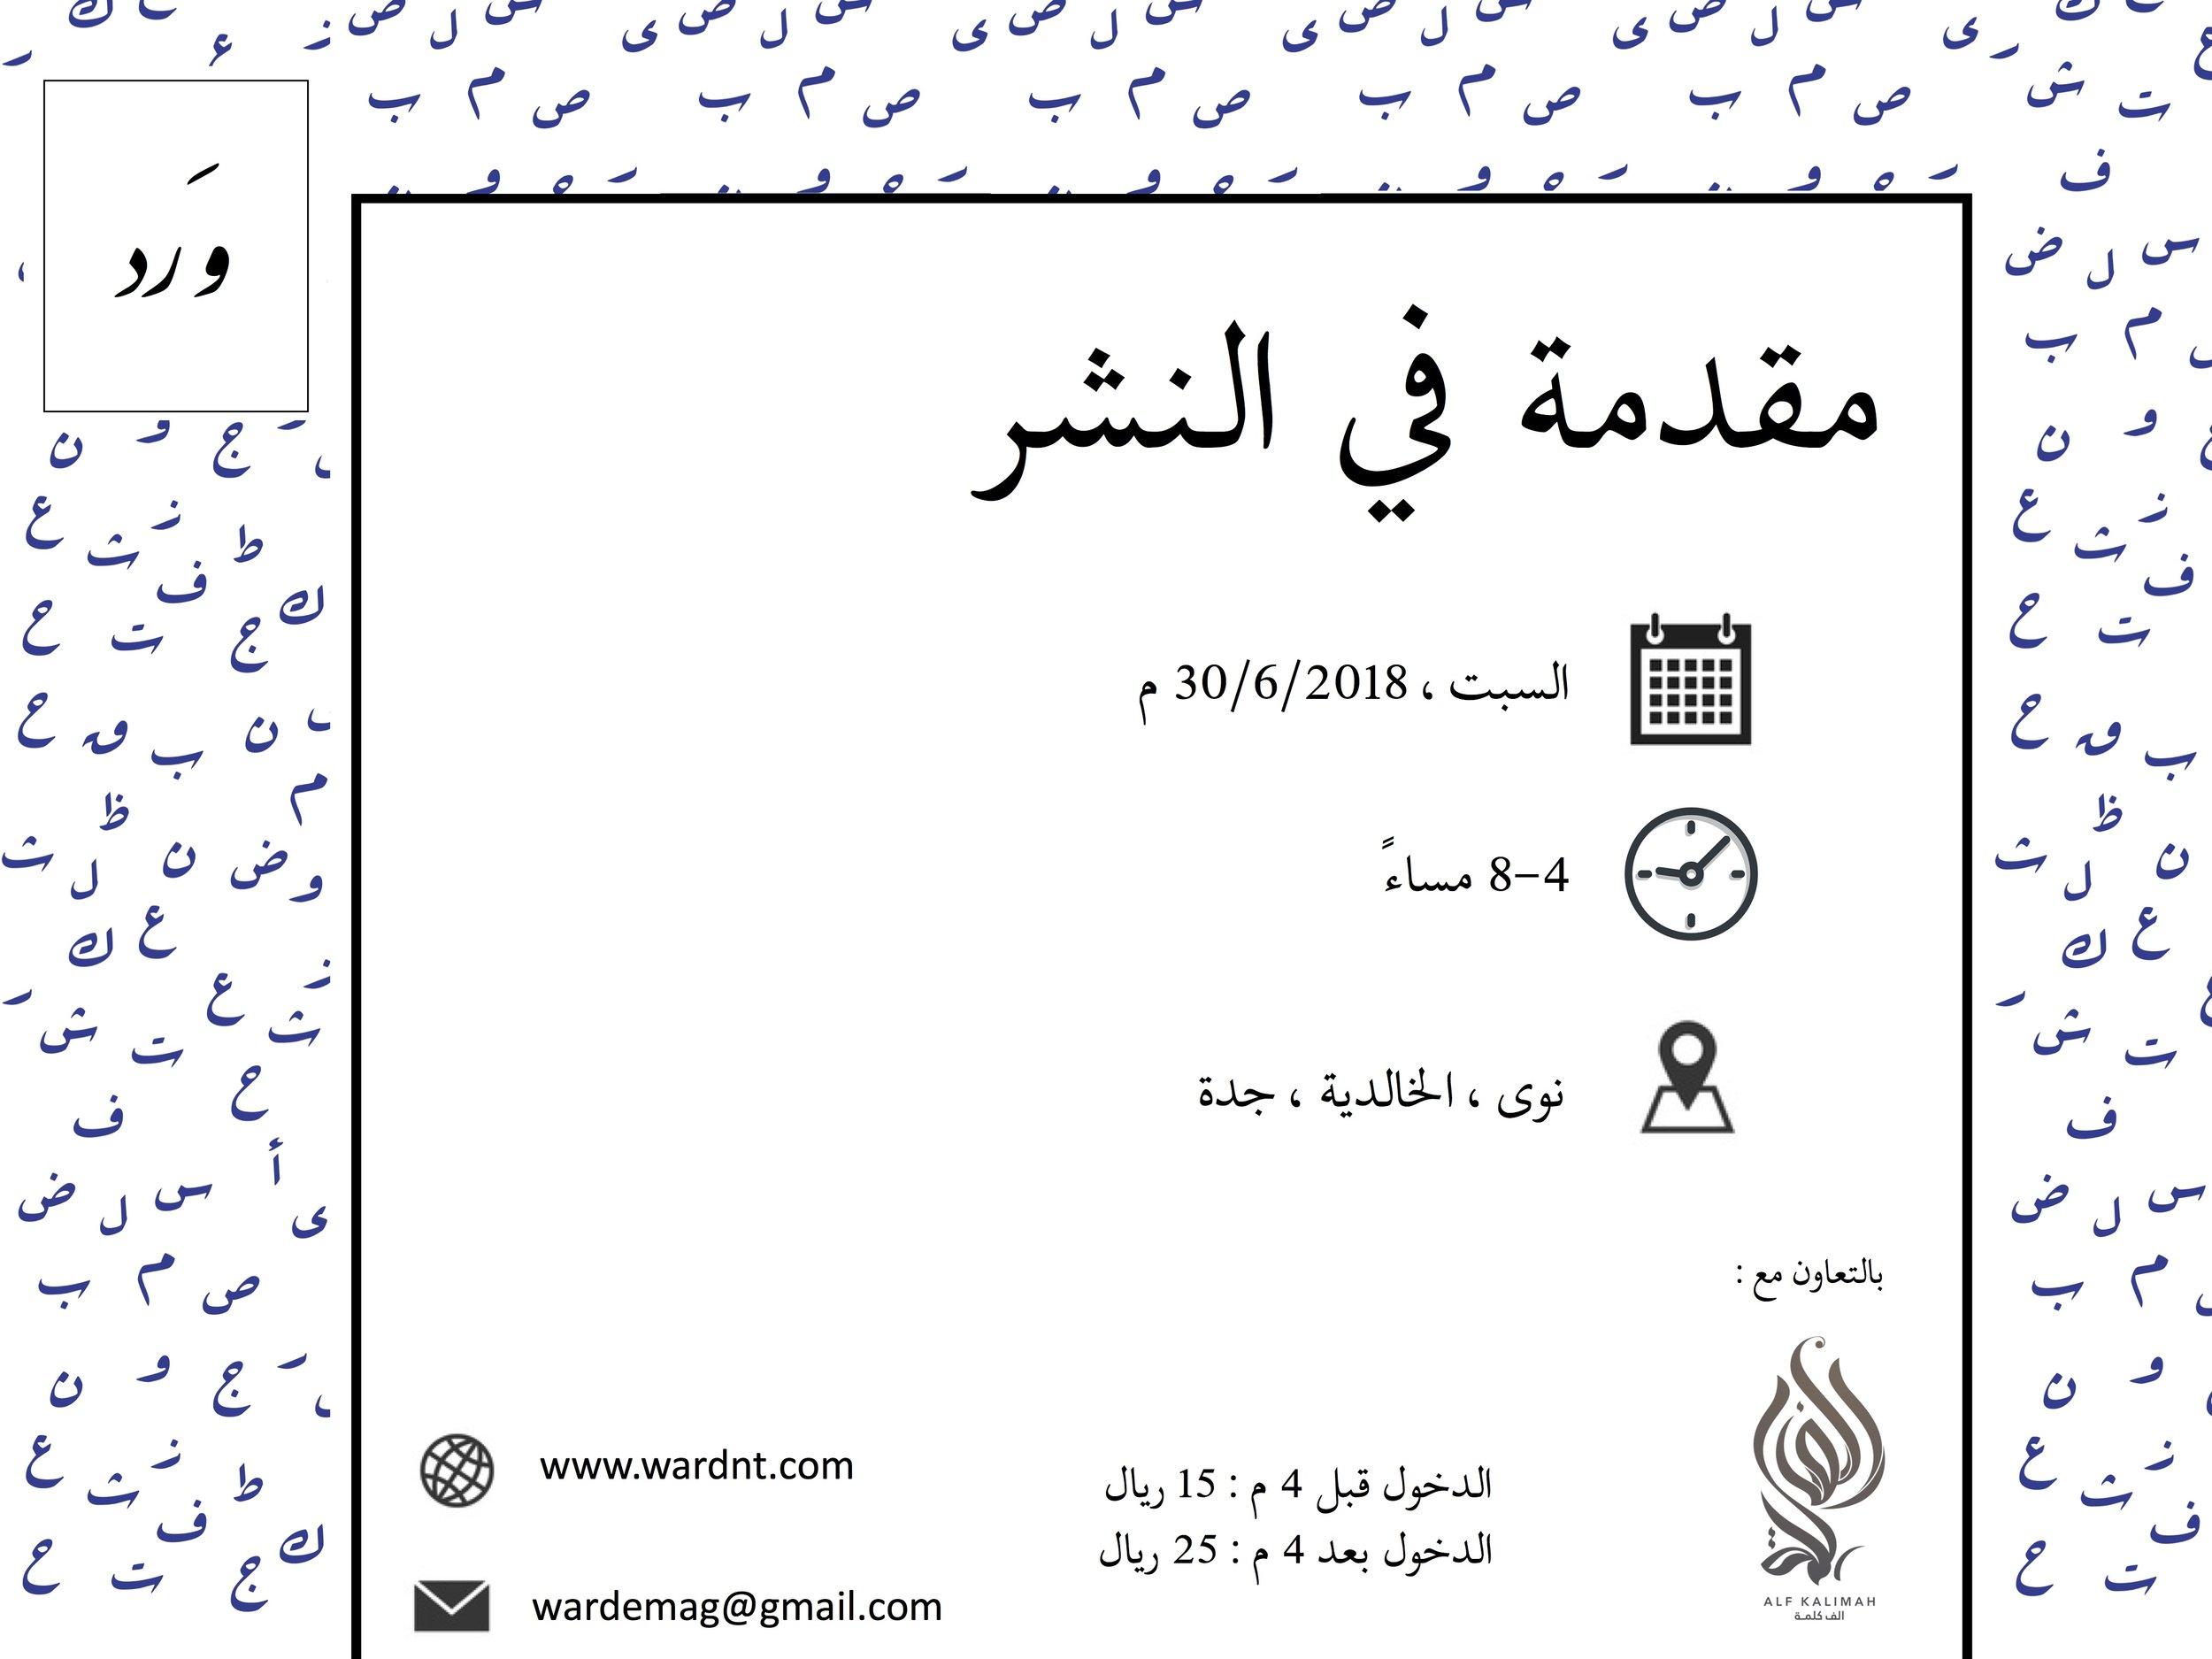 Ward intro Arabic.jpg